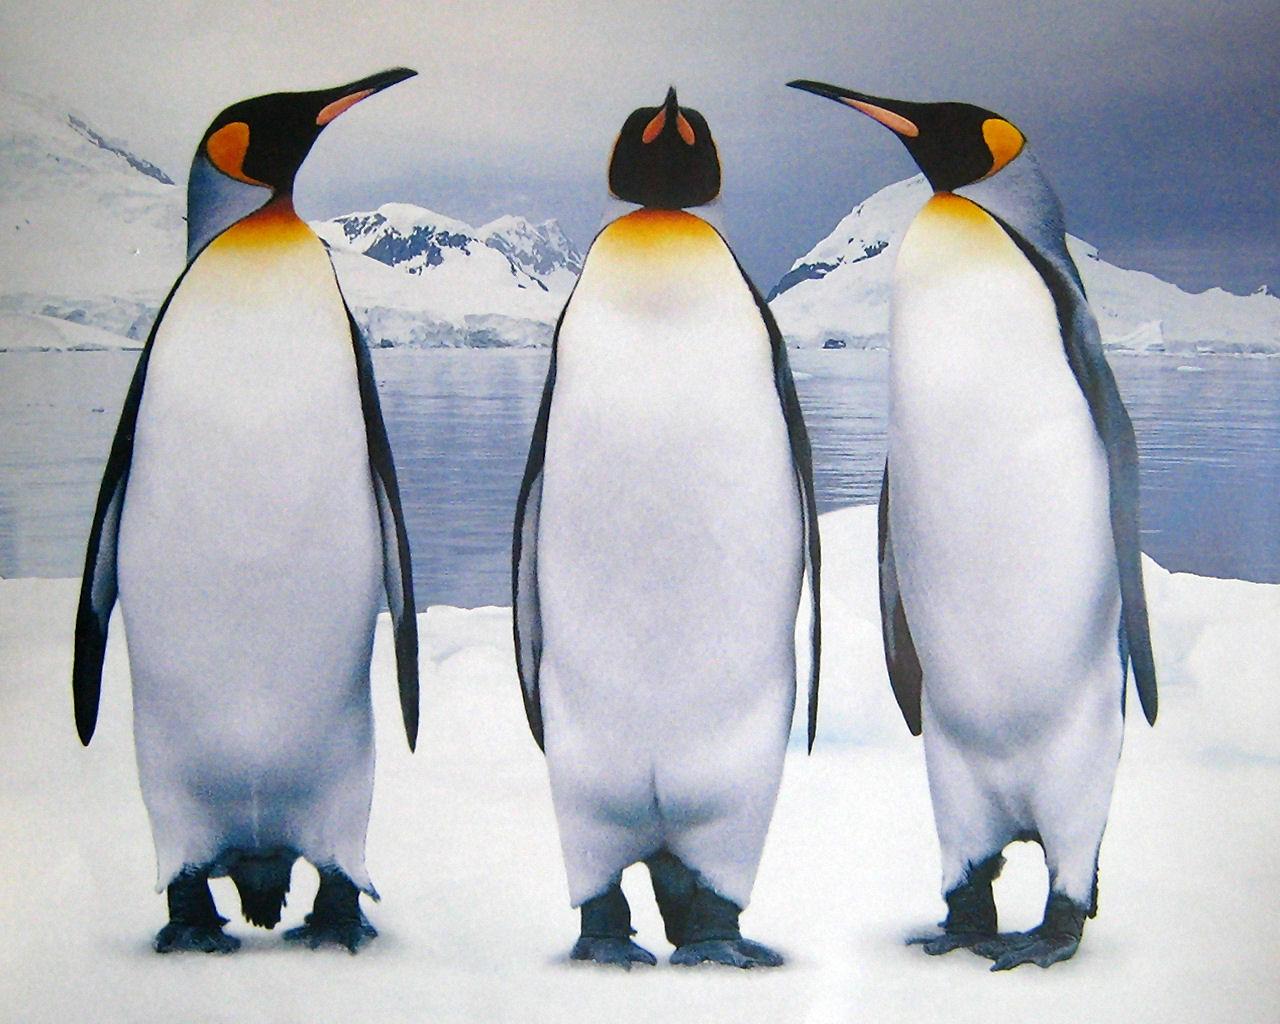 download wallpaper: pooldieren – drie pinguins wallpaper